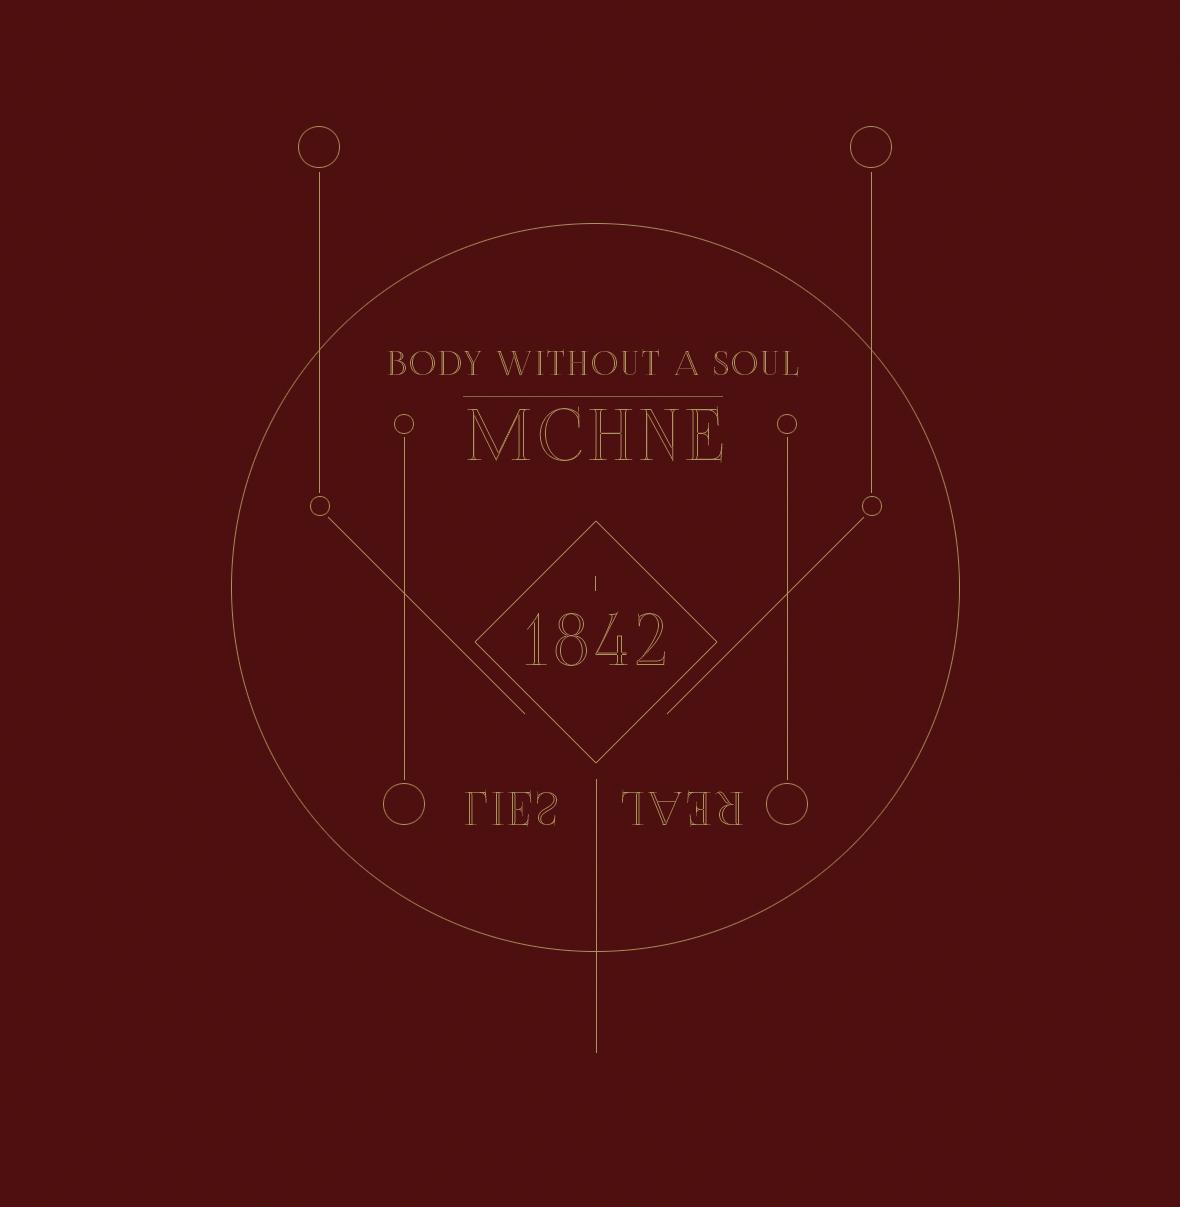 MCHNE - Body without a soul